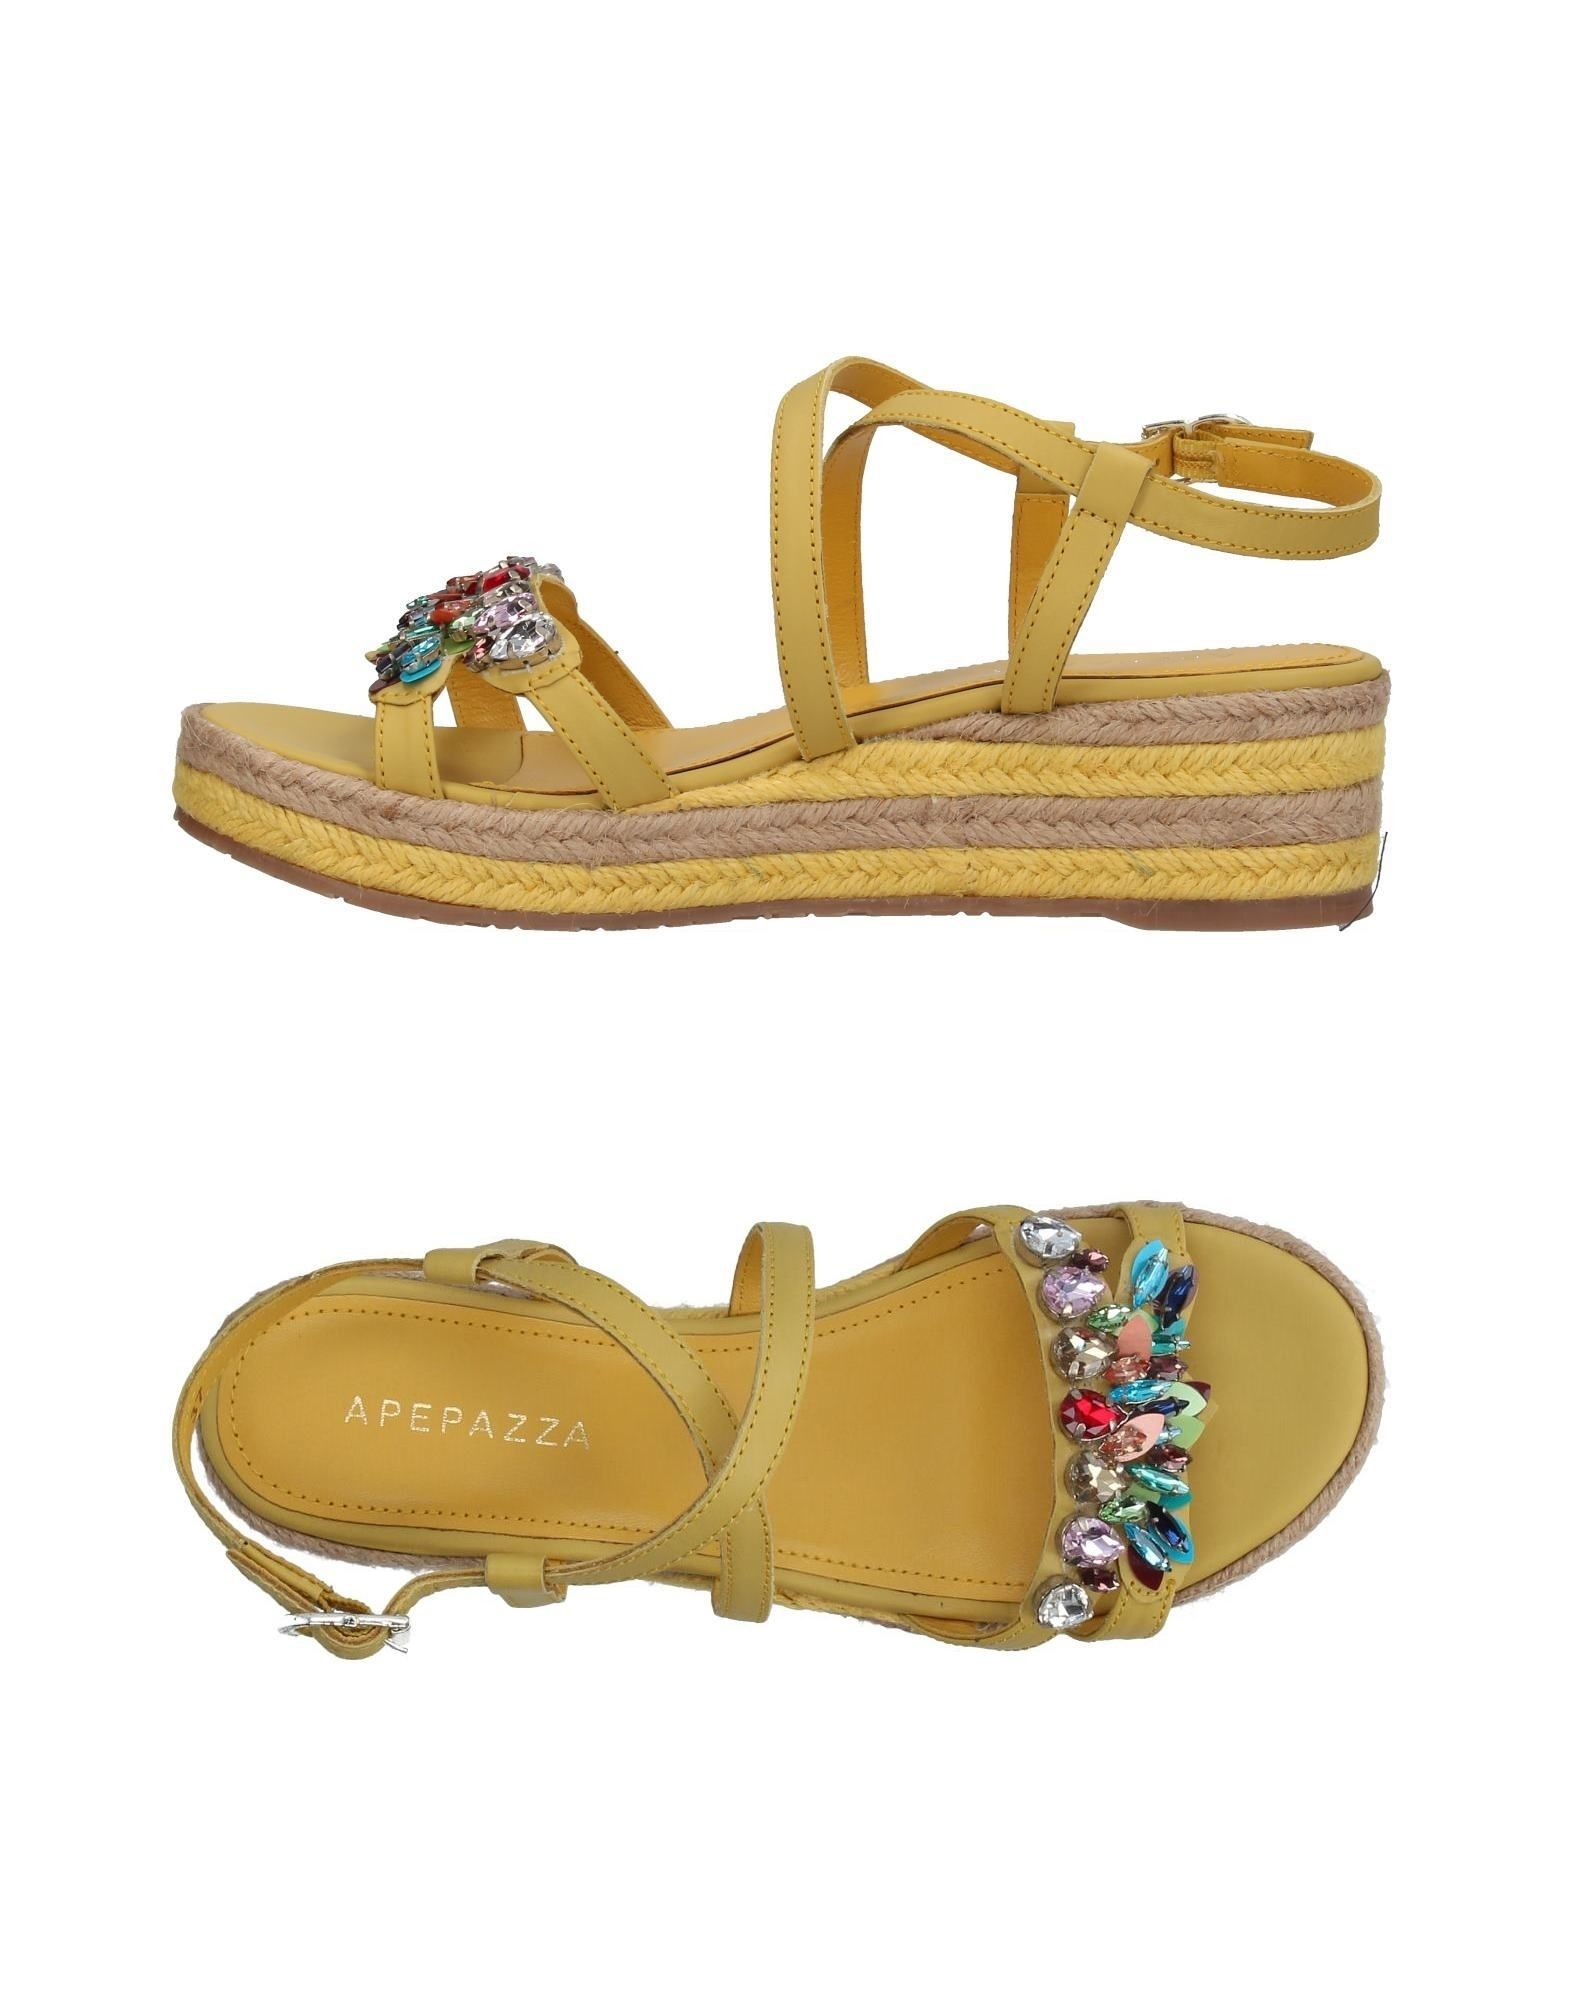 Apepazza Sandalen Damen  11372089OV Schuhe Gute Qualität beliebte Schuhe 11372089OV cb8232